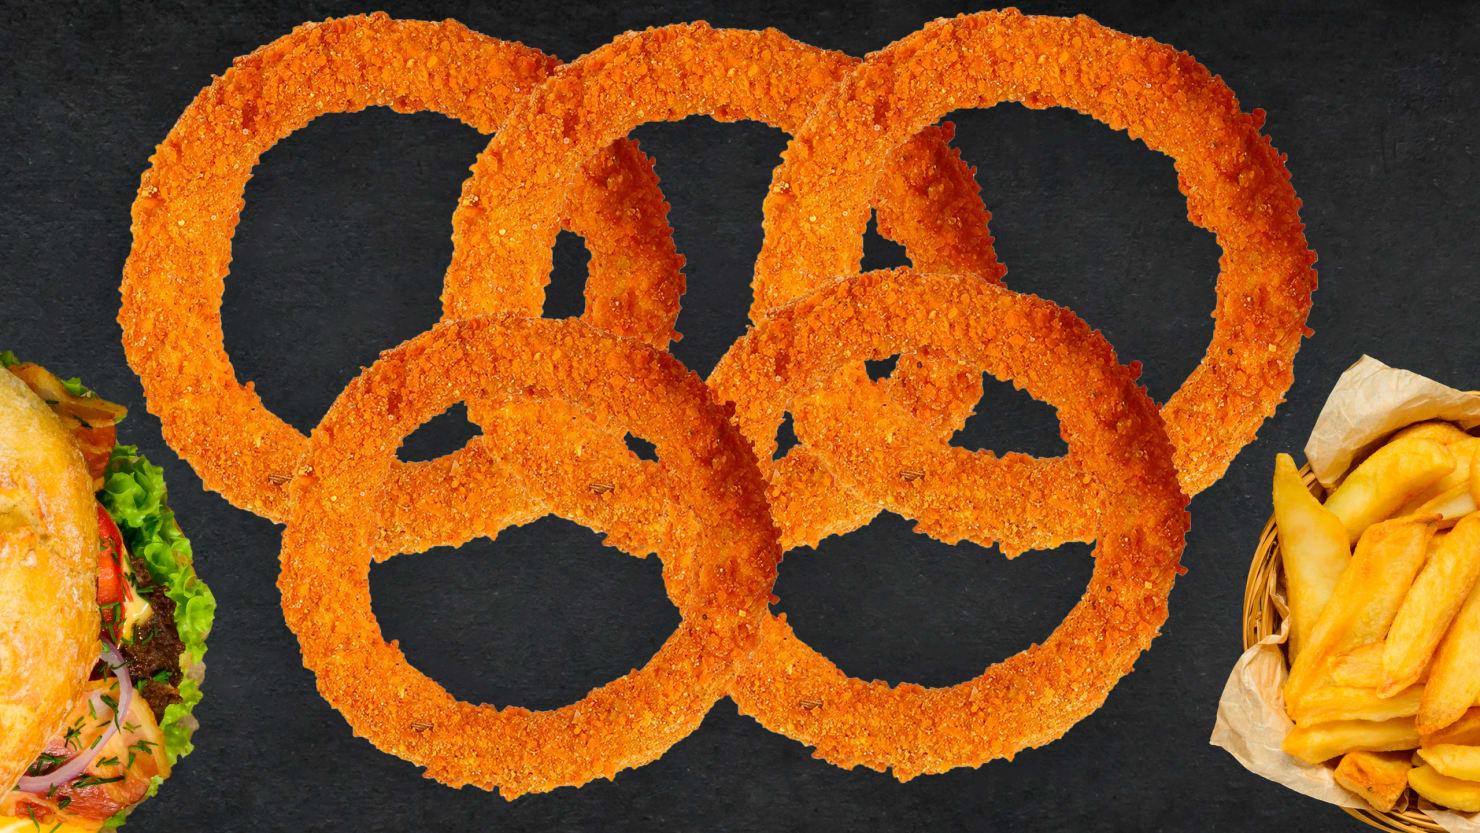 onion rings fries burger olympics winter chloe kim food fast high fat carb atkins low high